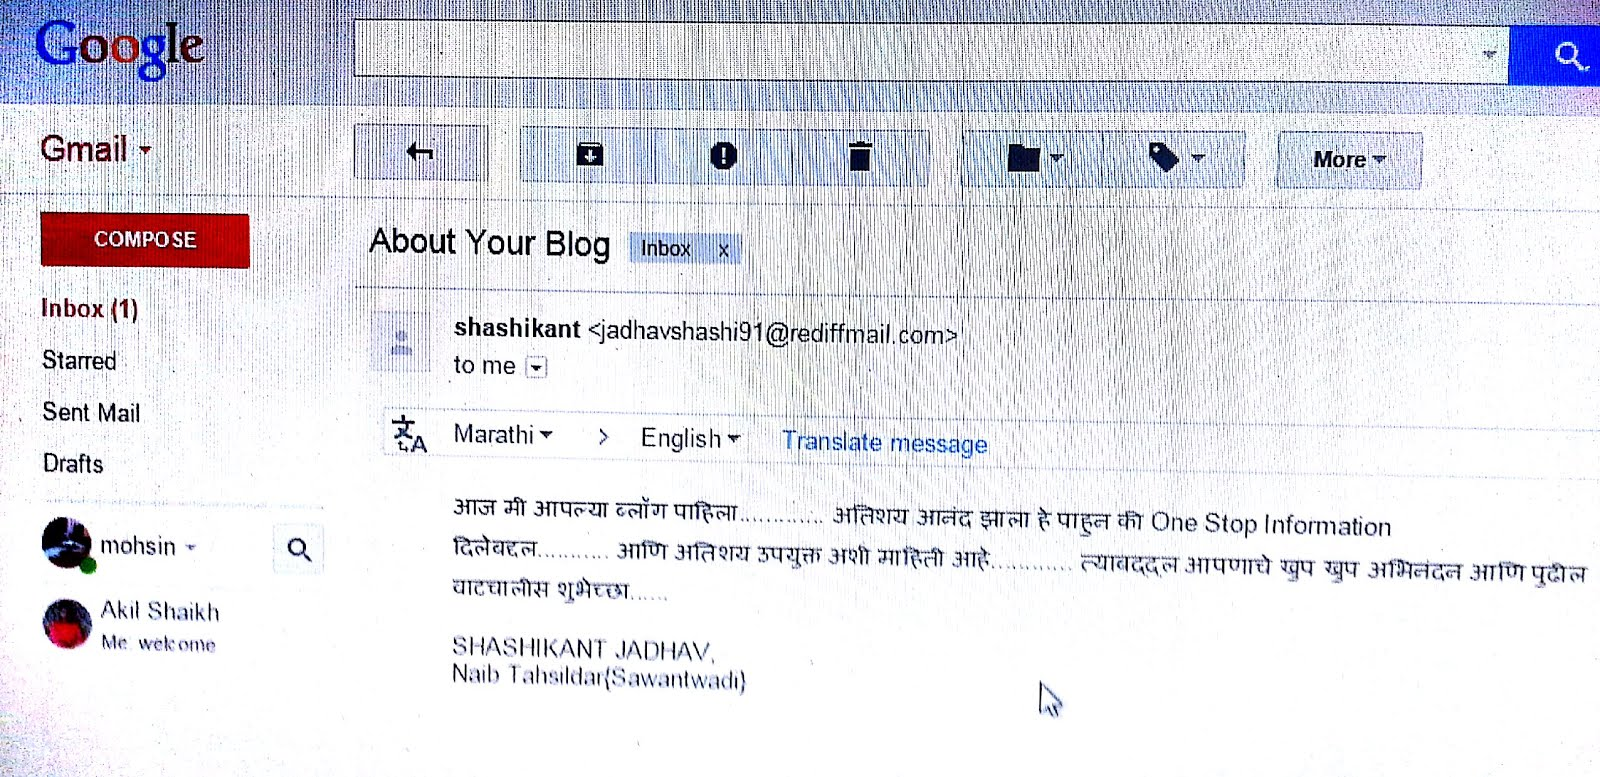 मा.श्री.शशिकांत जाधव,तहसिलदार